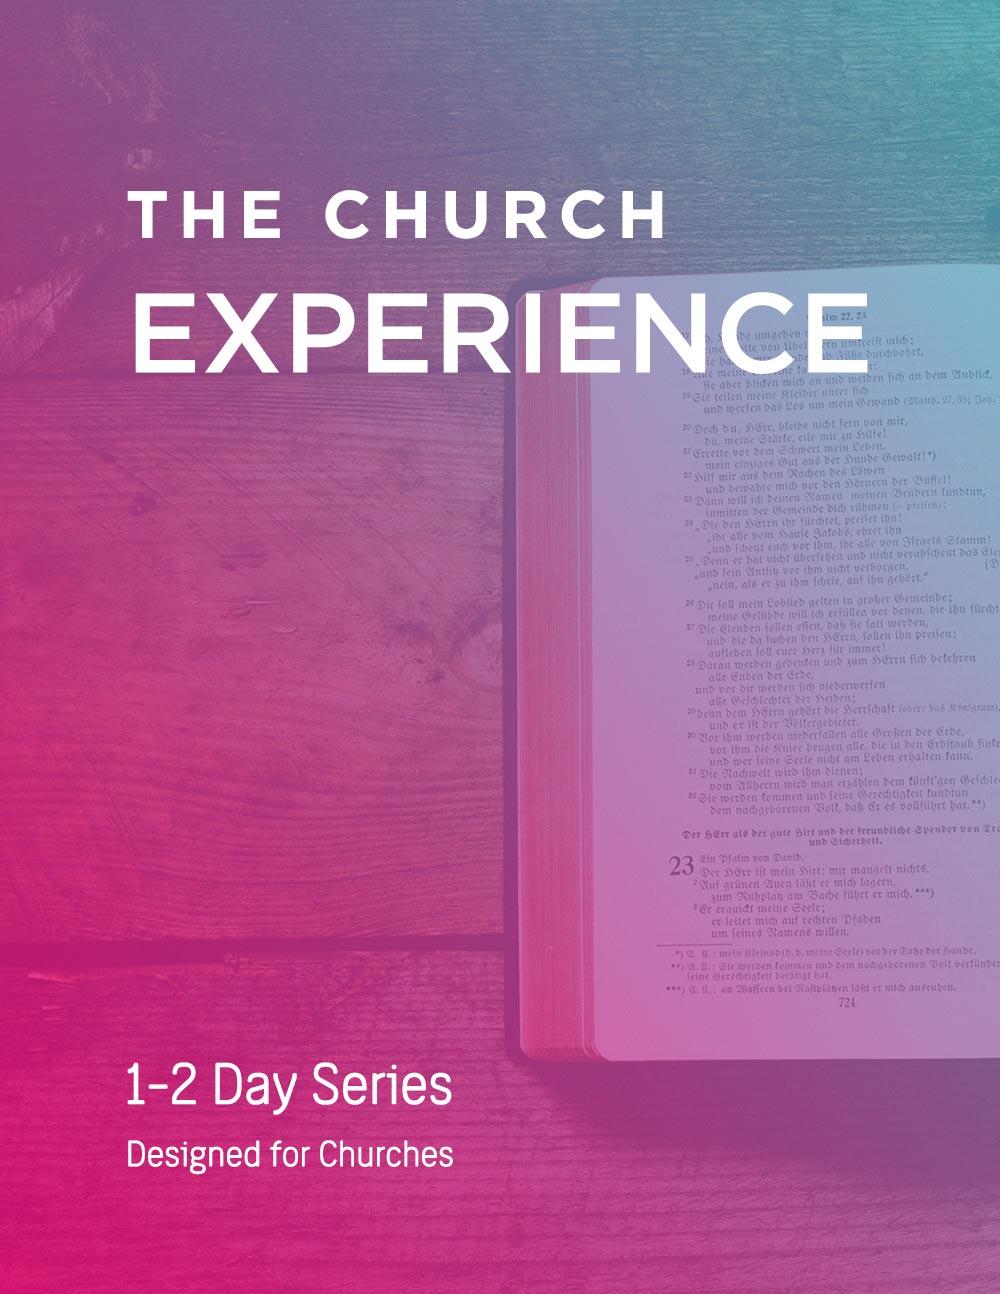 The Church Experience (2).jpg